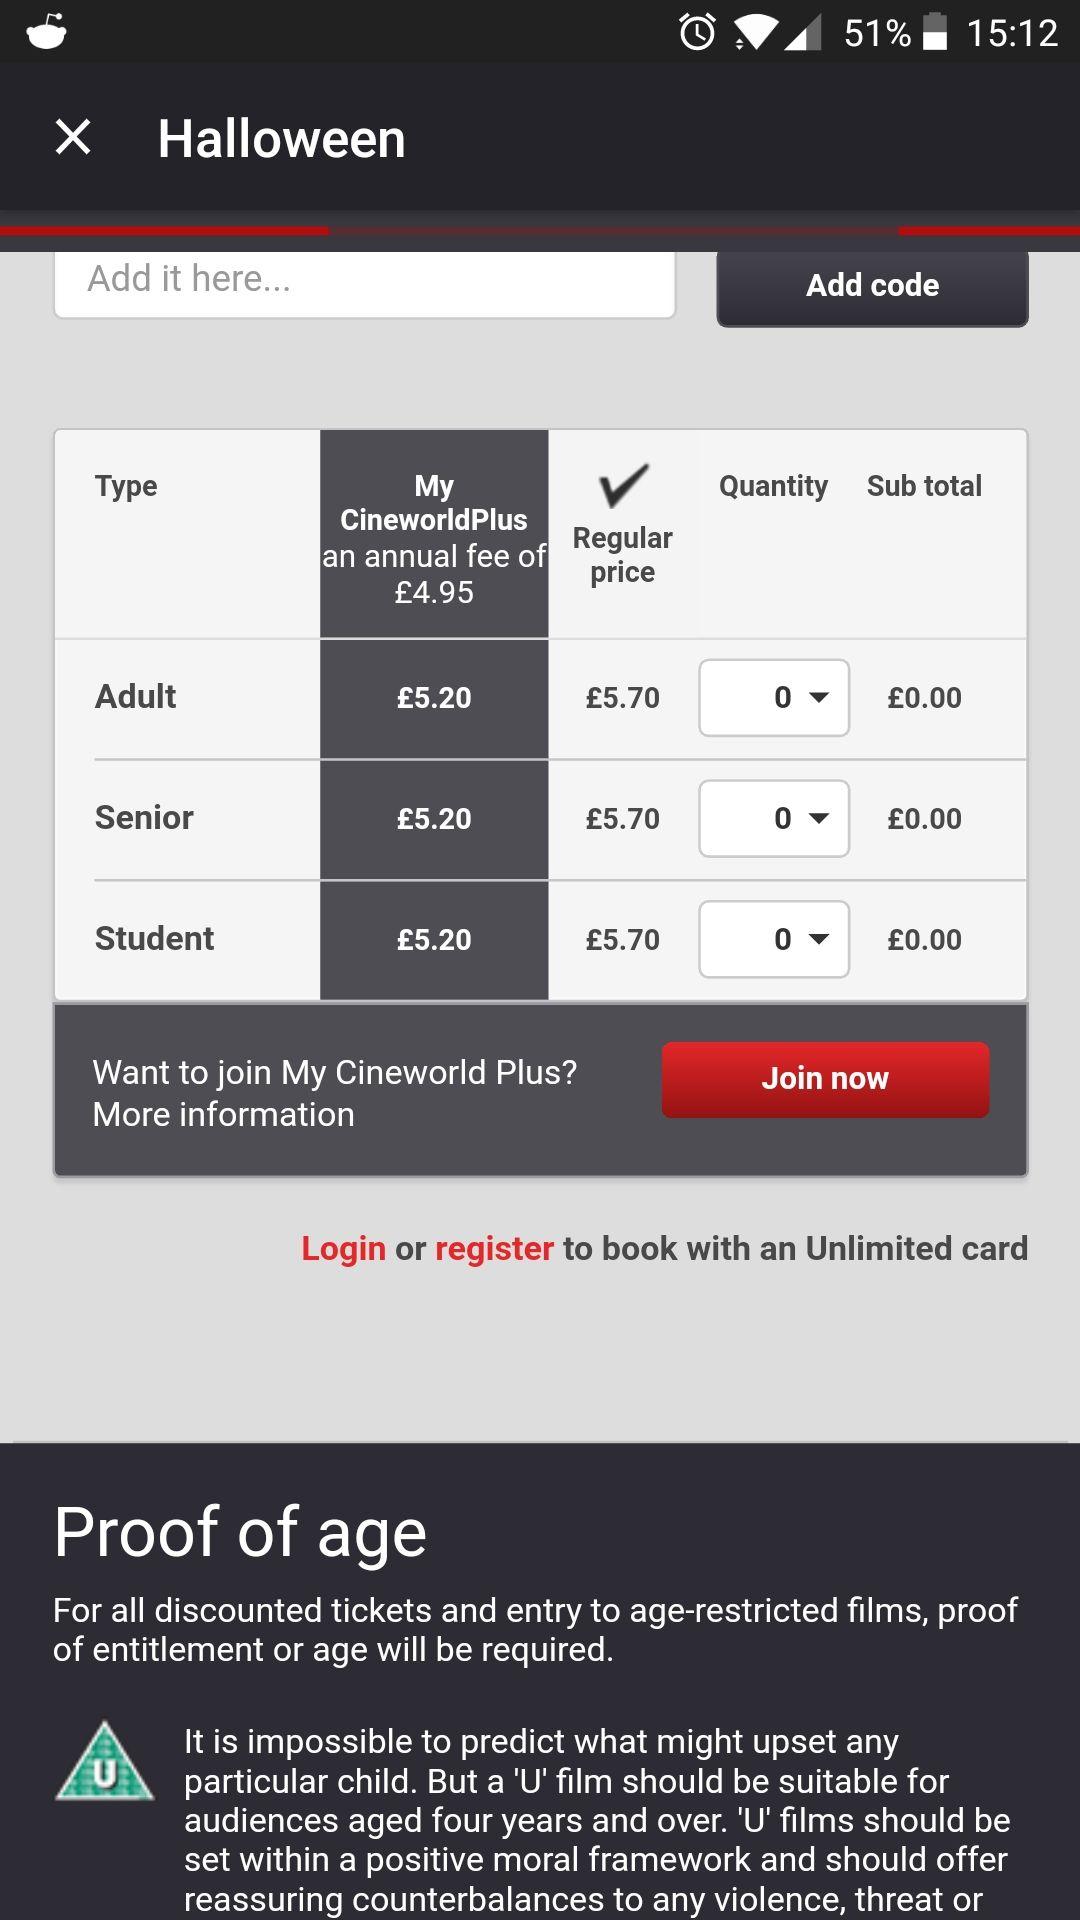 Cineworld tickets for £5.70